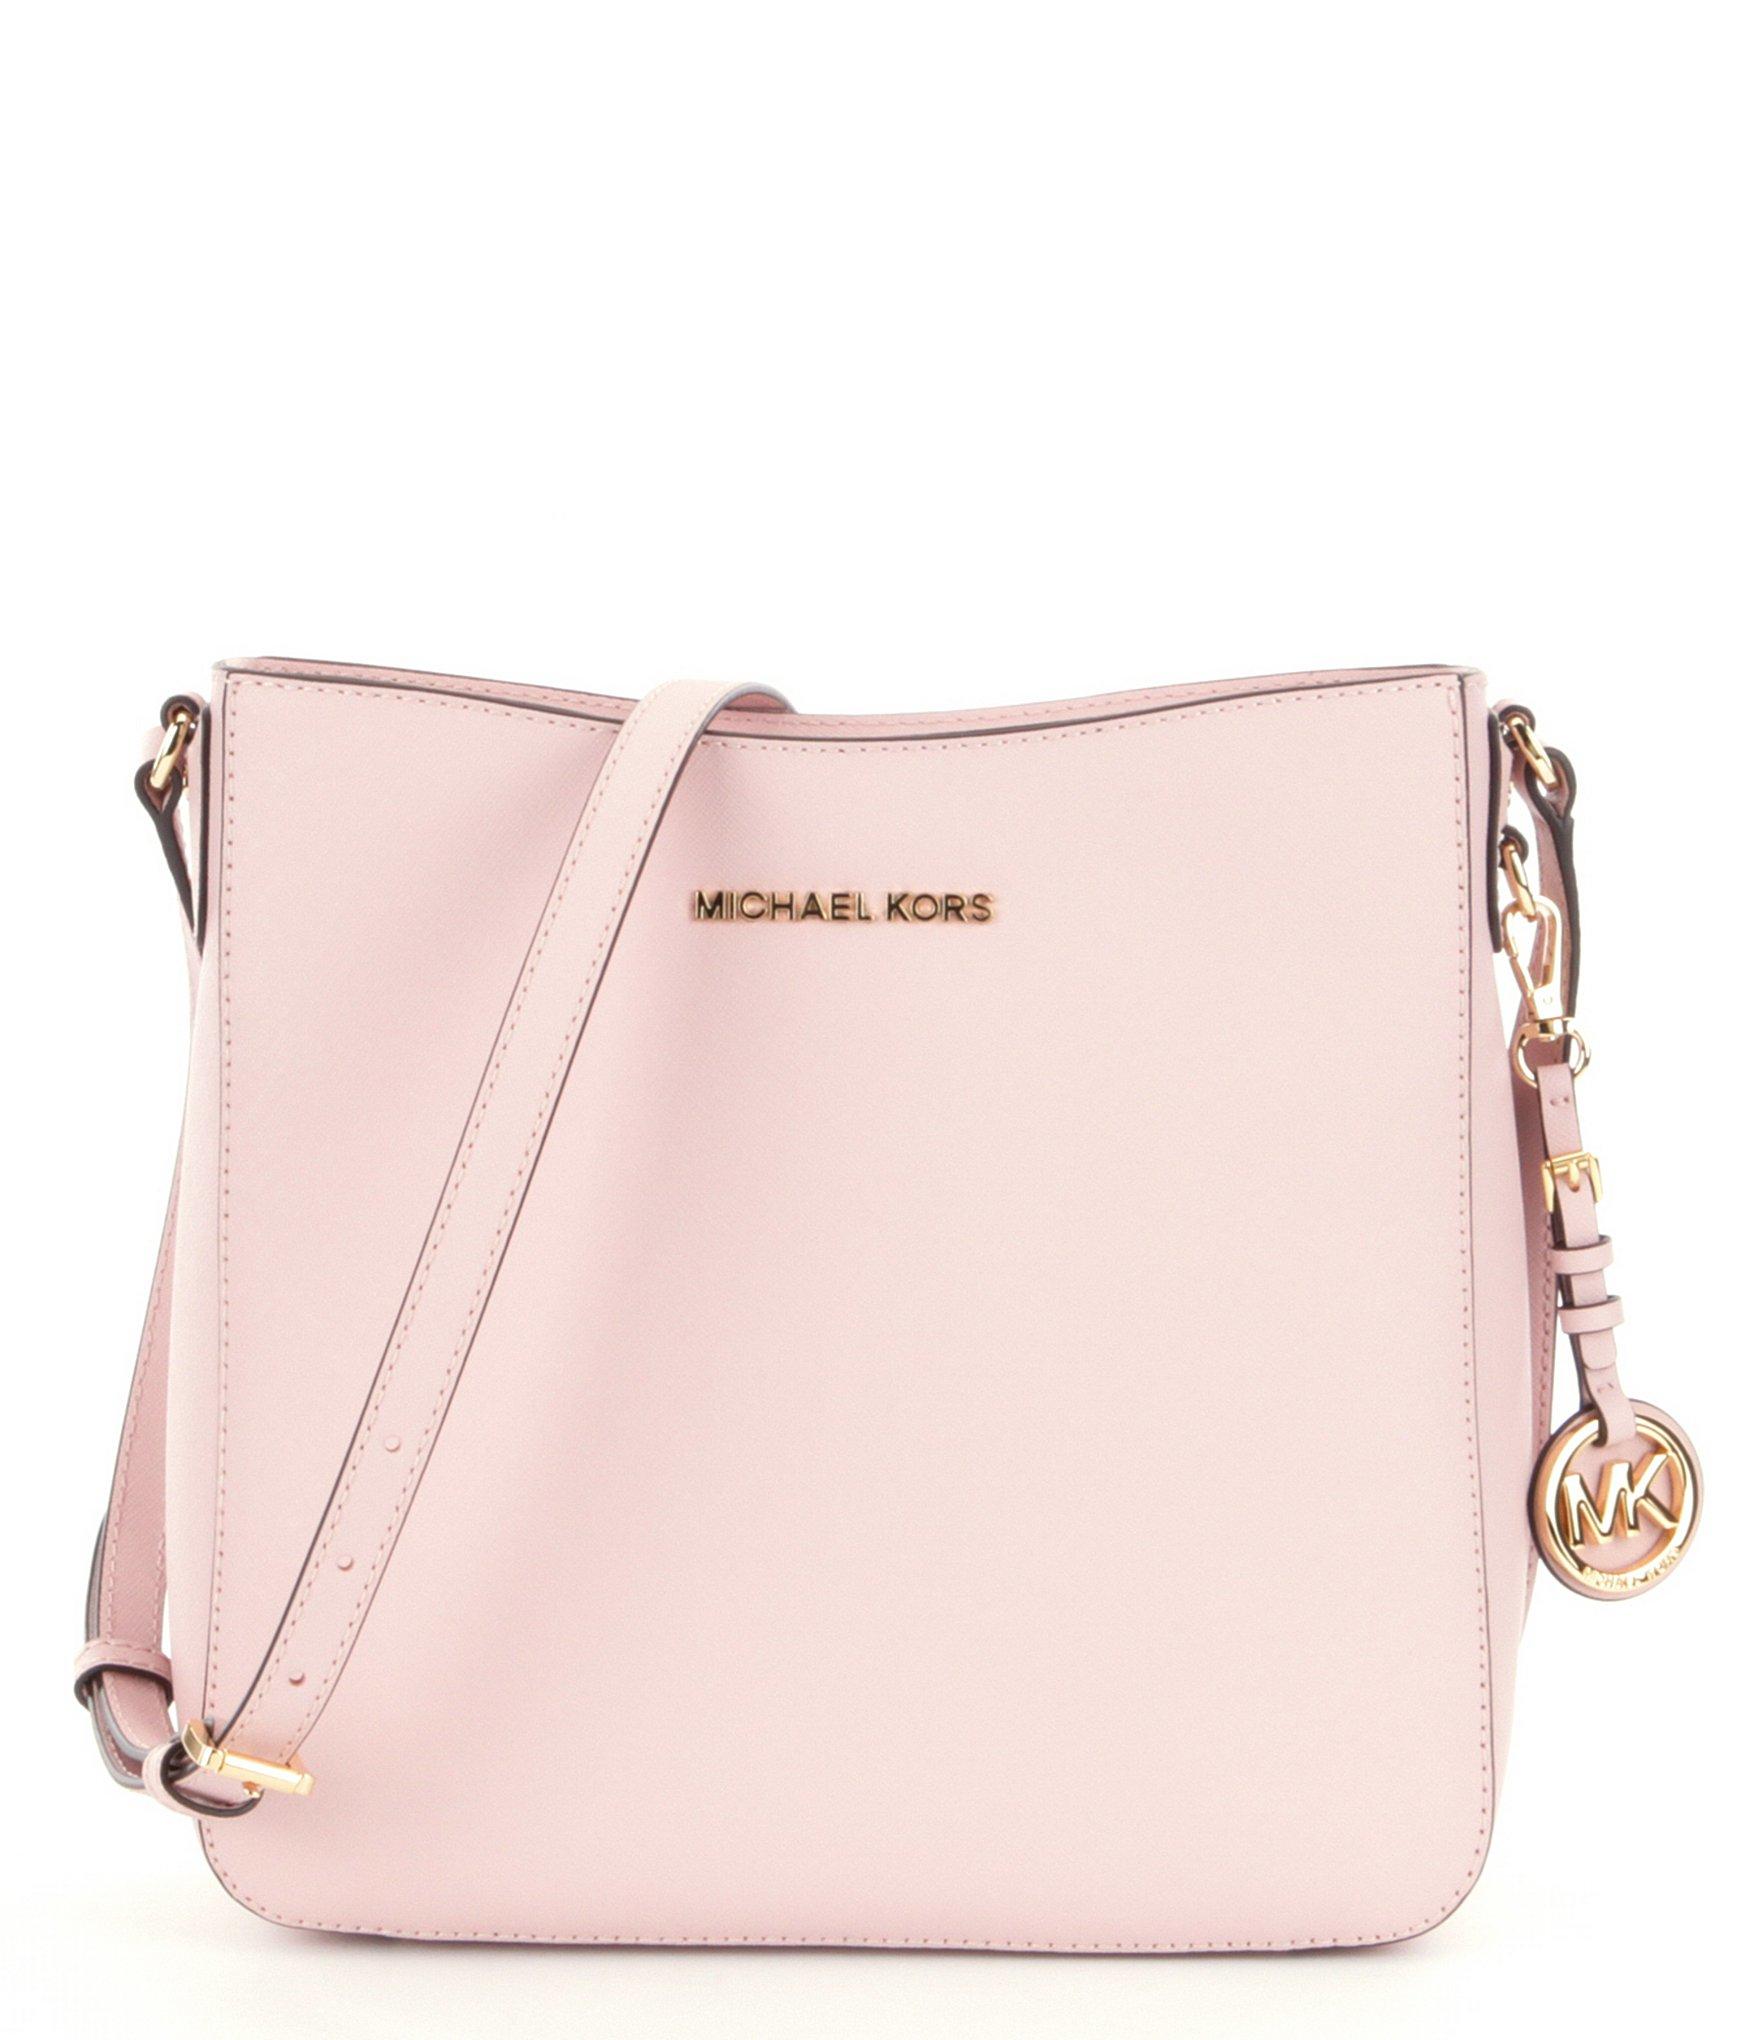 33158c9ea13f Lyst - MICHAEL Michael Kors Jet Set Travel Large Messenger Bag in Pink